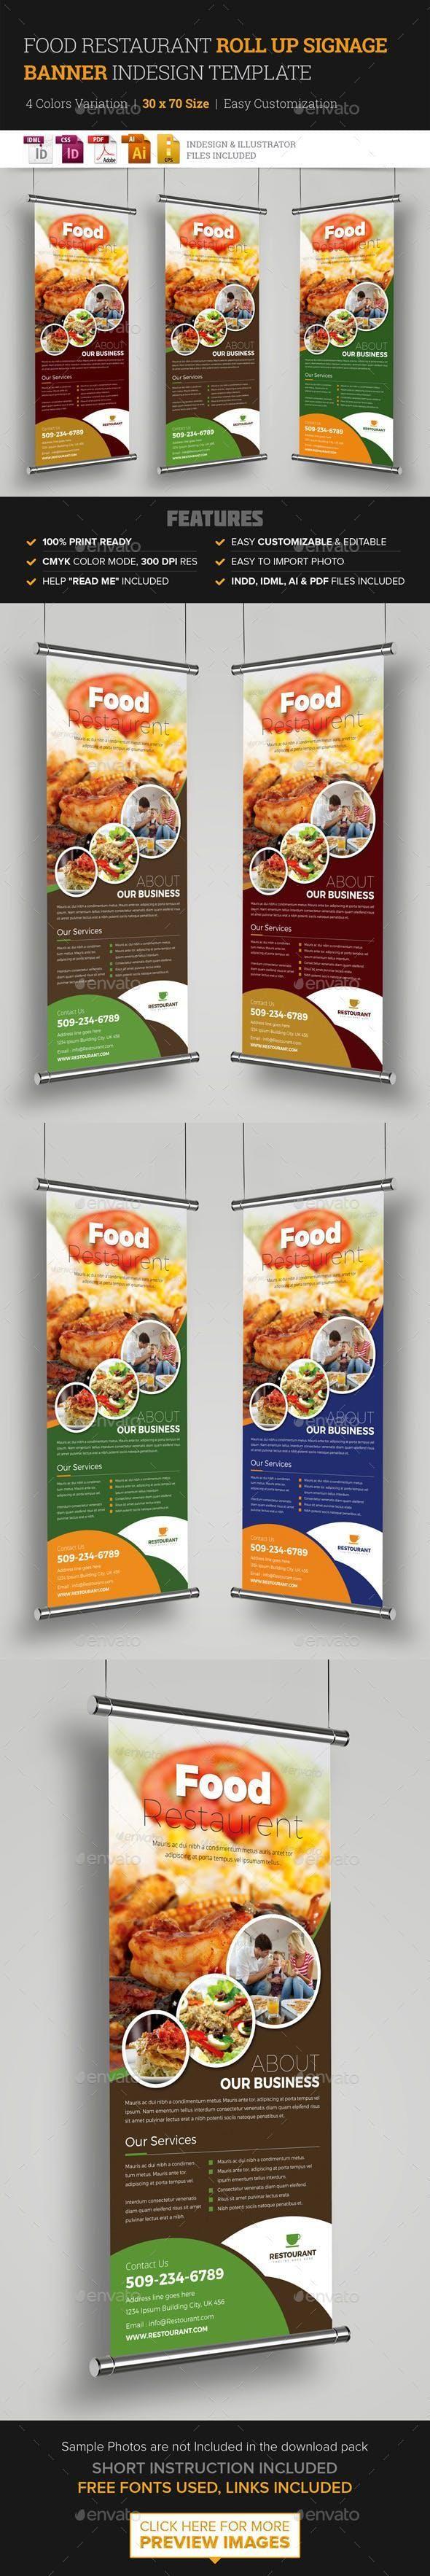 Food Restaurant Roll Up Banner Signage Template #GraphicDesign #marketing #desig...